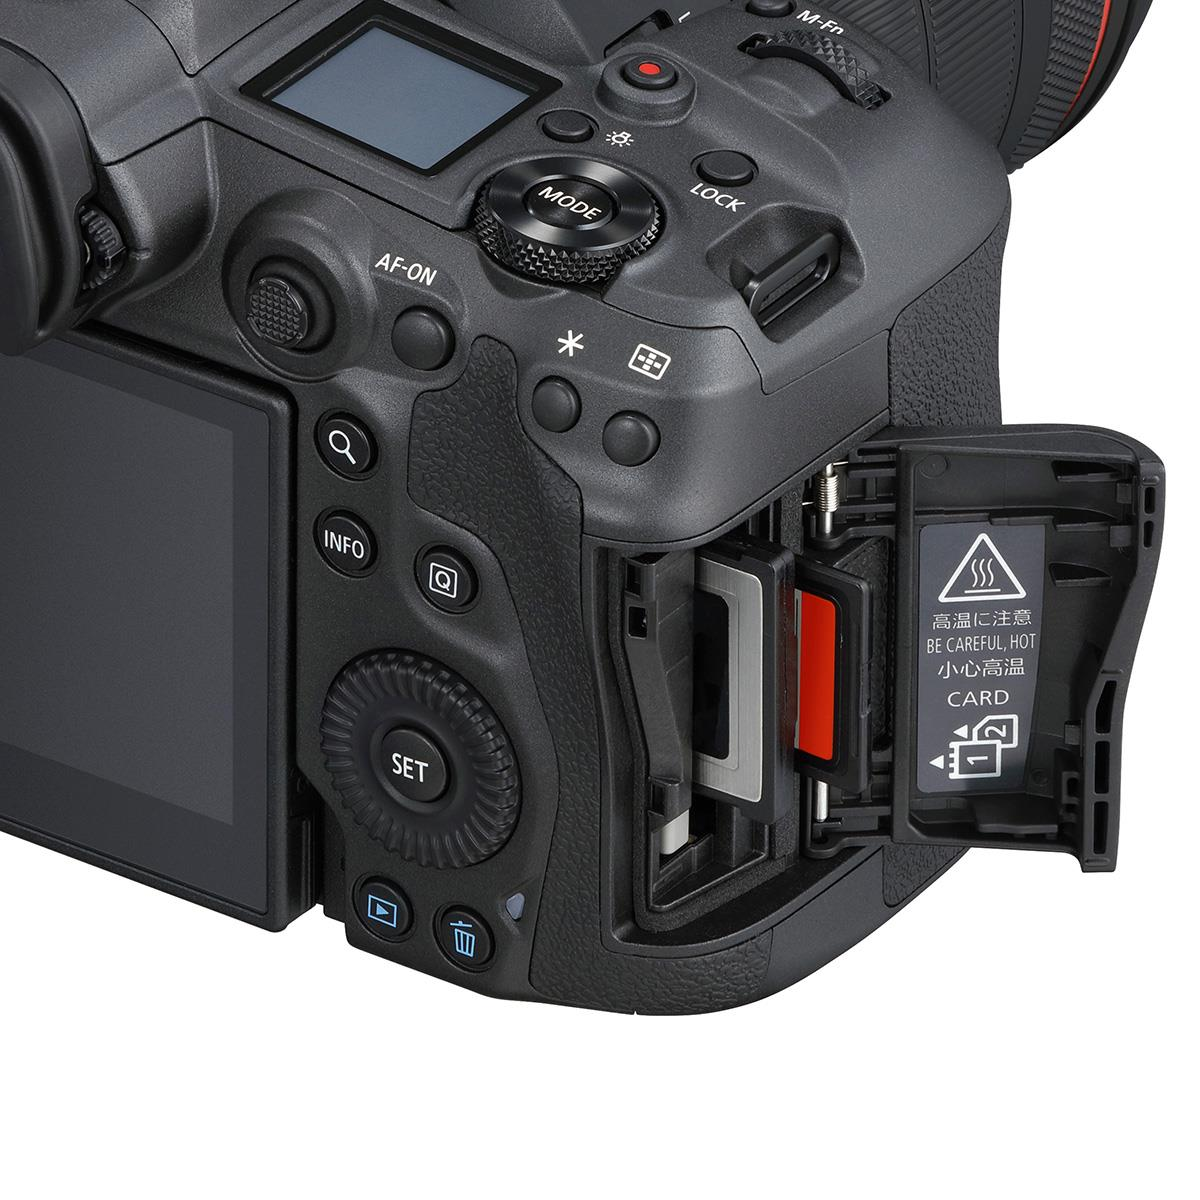 canon eos r5 price image